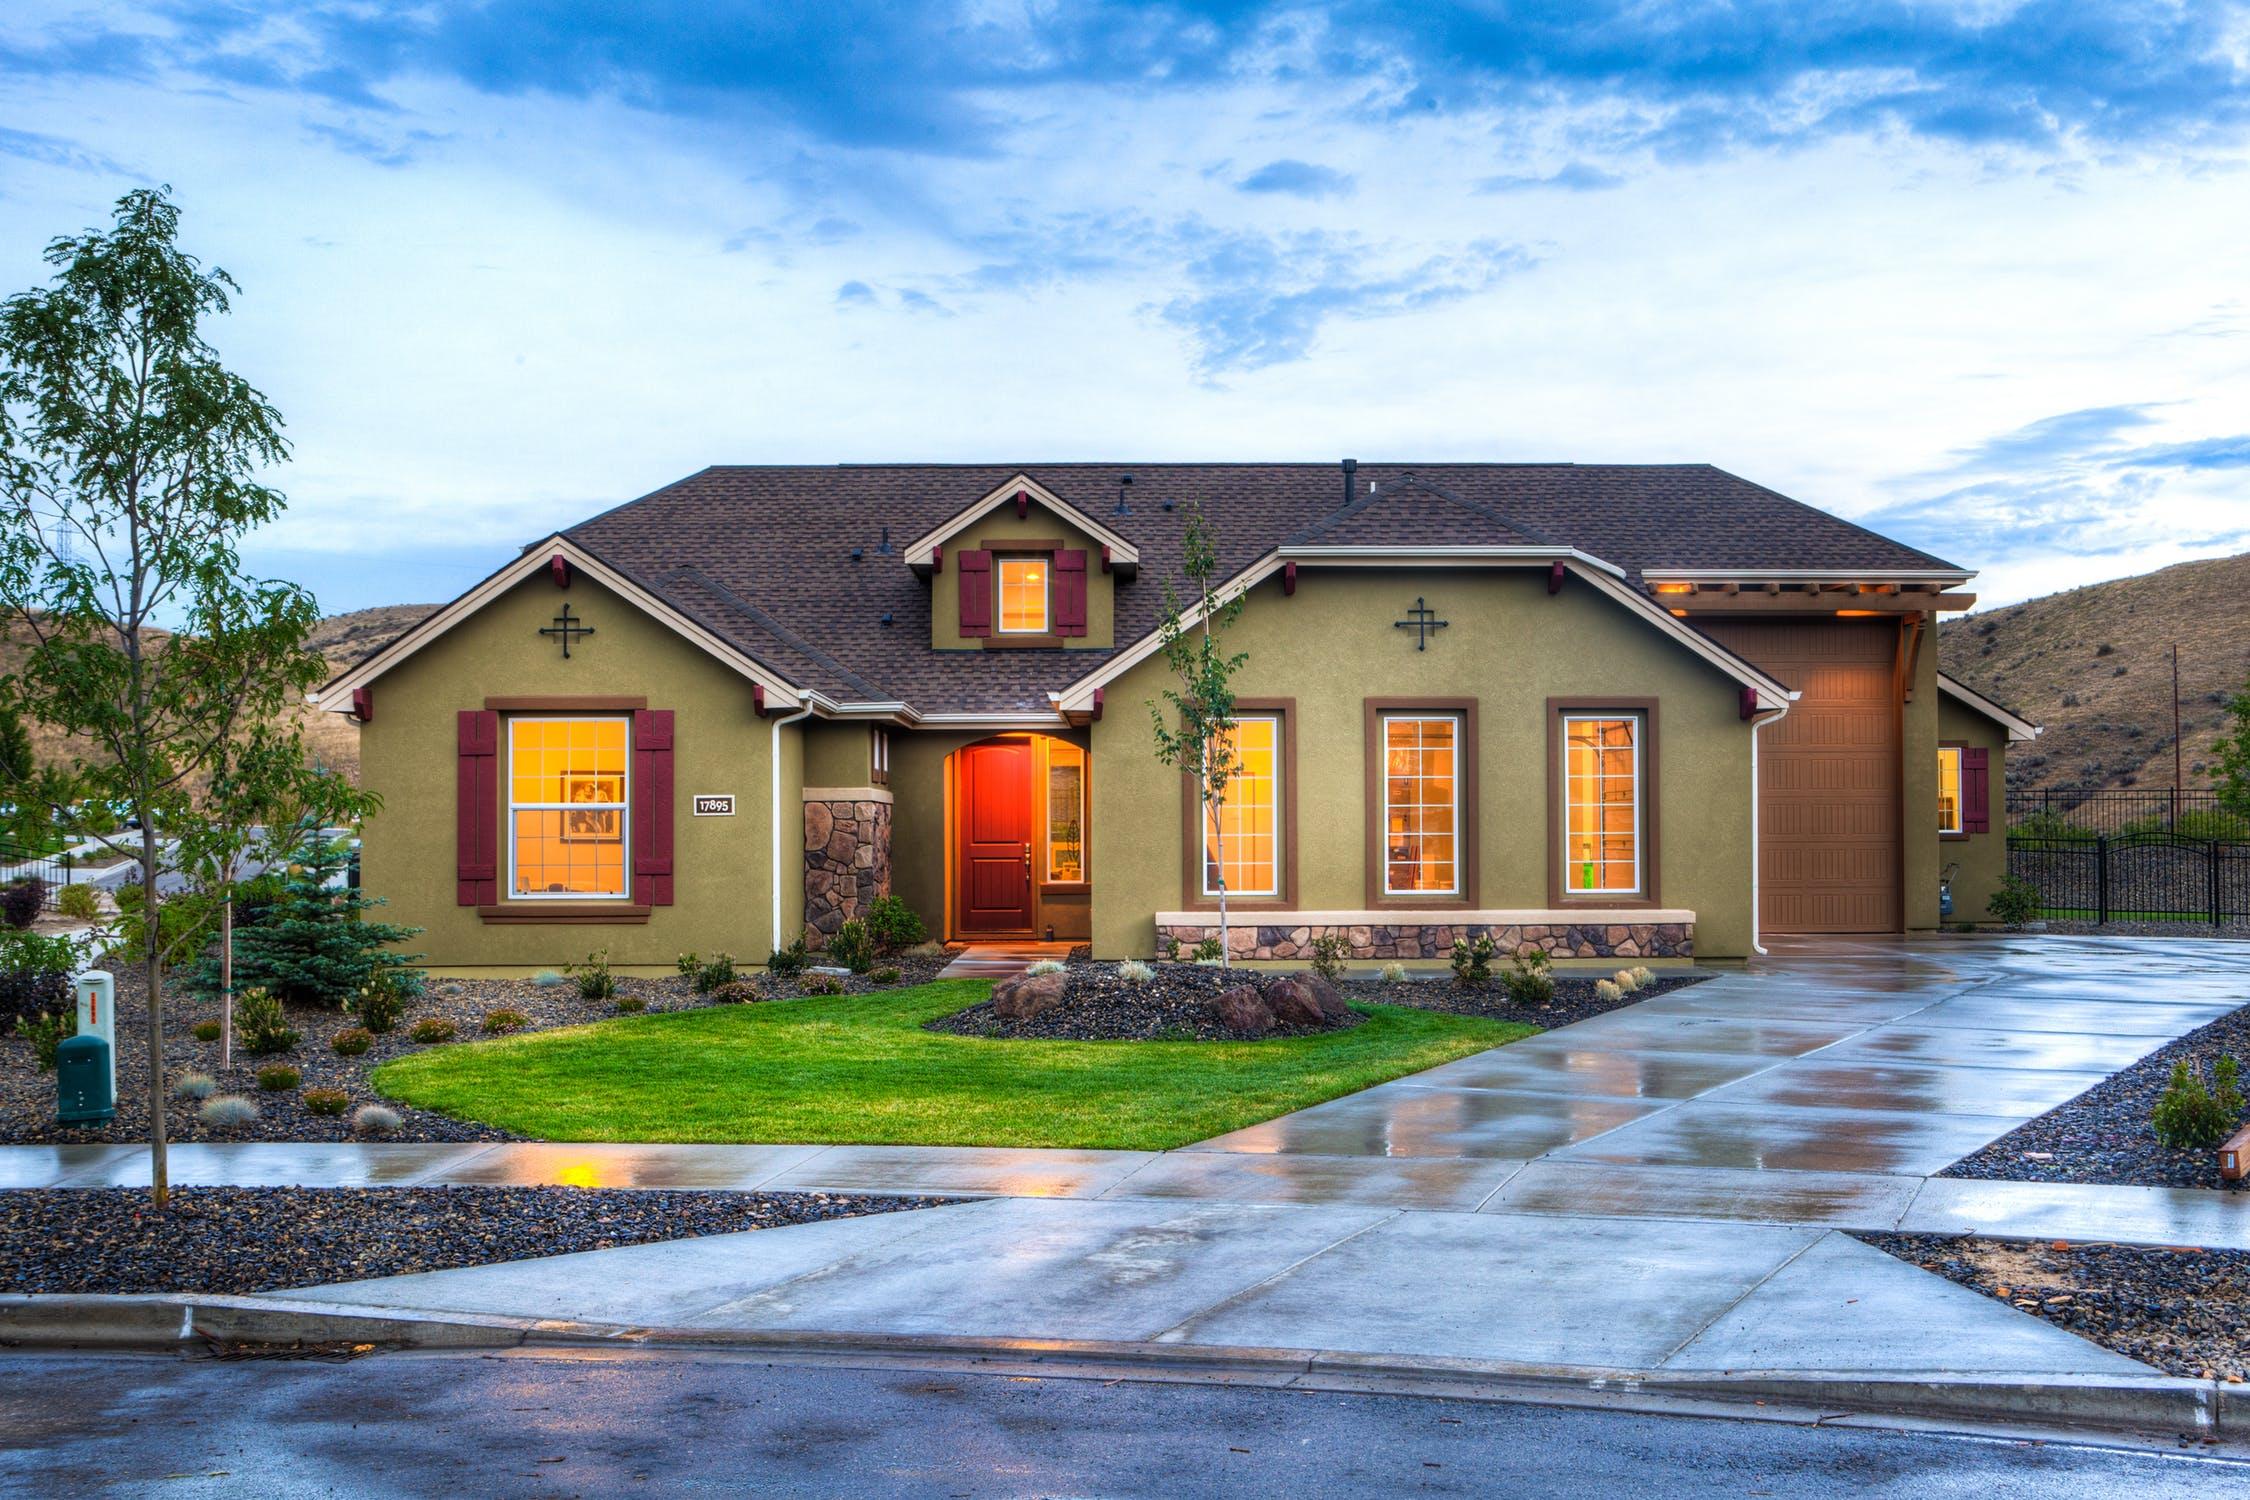 Home Buying After Corona Virus